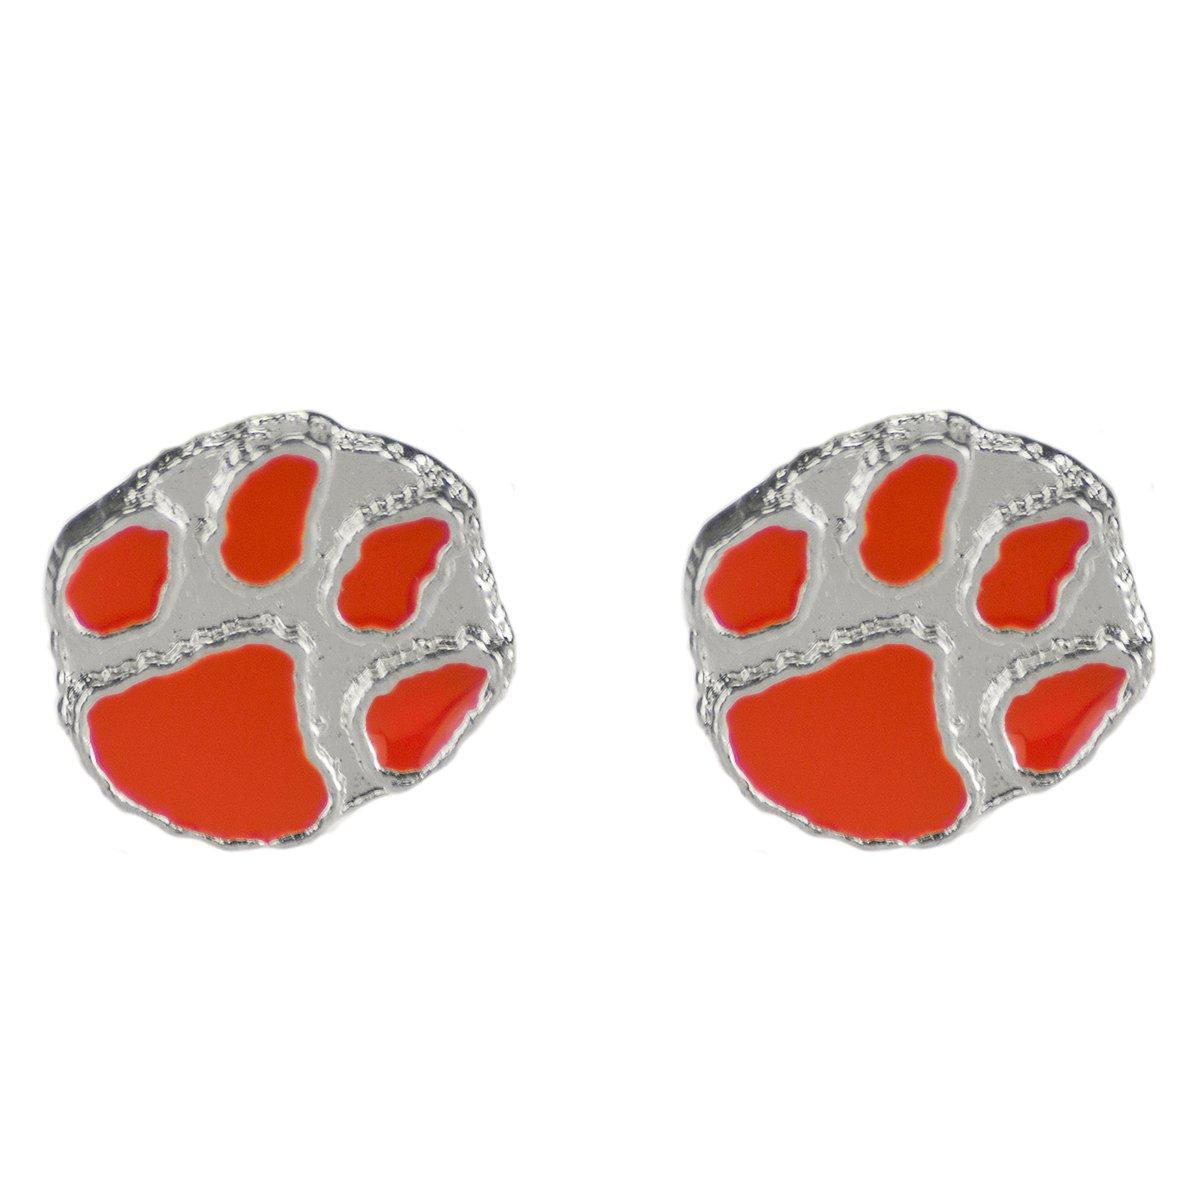 SANDOL Clemson Tigers Logo Stud Earrings